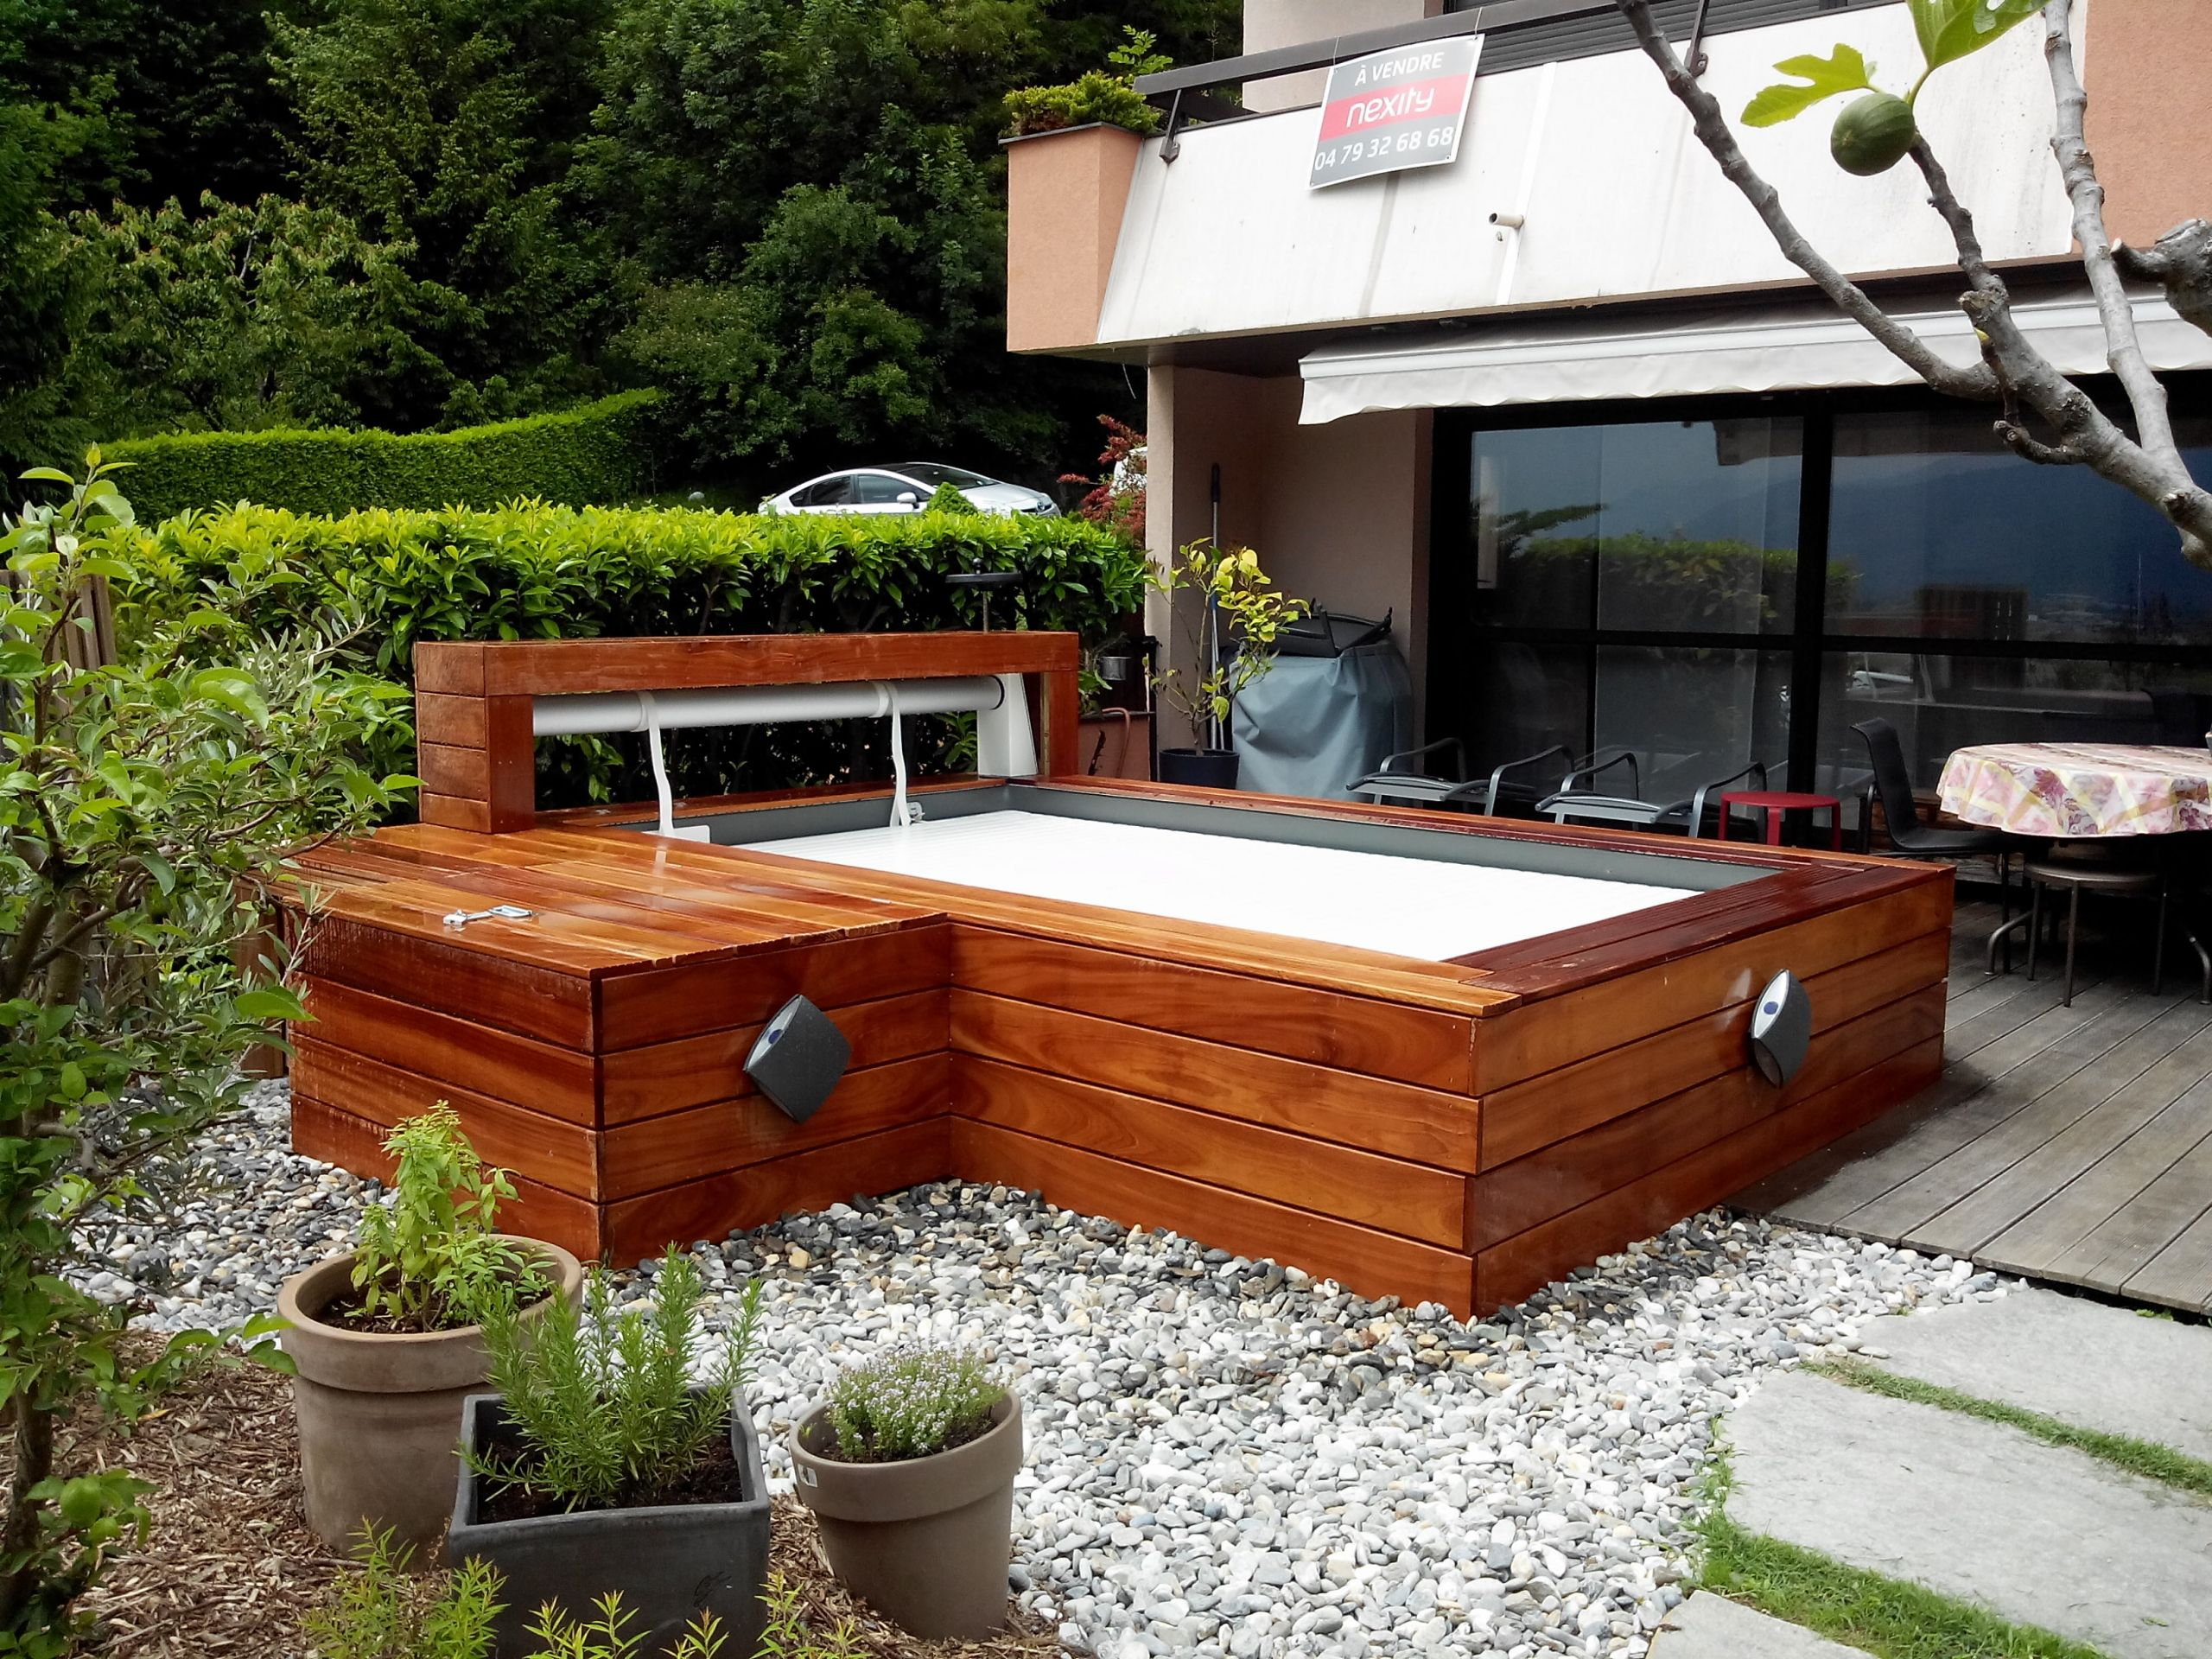 Mini Piscine Petit Jardin mini piscine bois mini piscine l univers de la petite